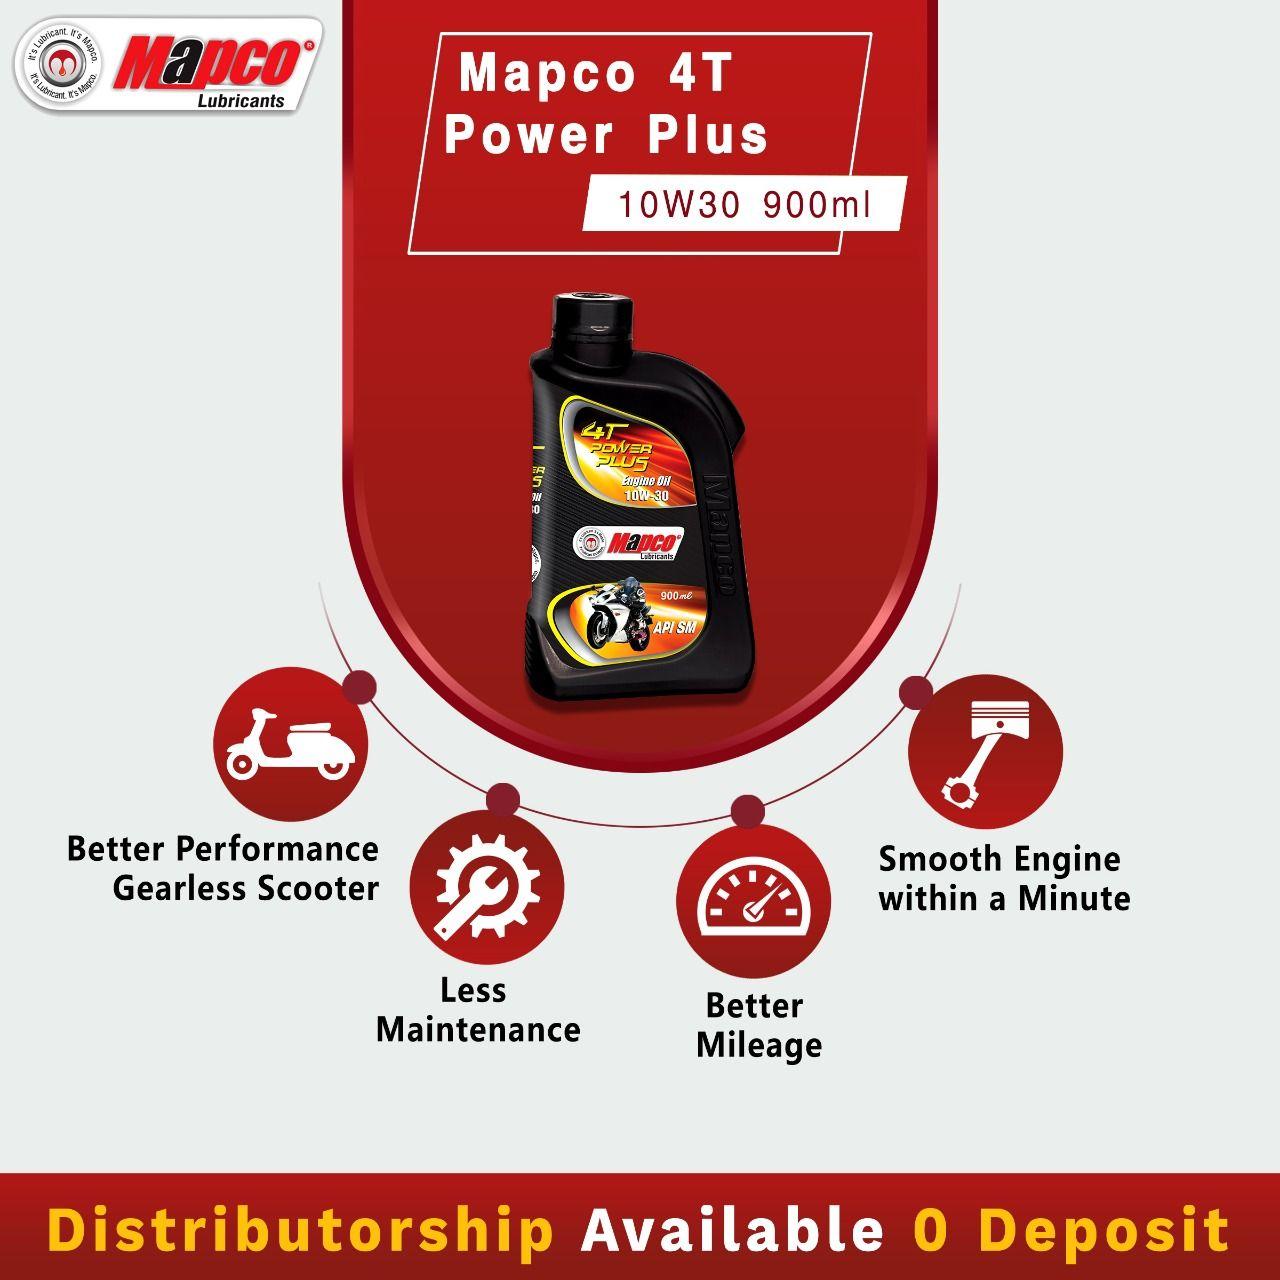 Mapco Lubricants Distributorship Available Zero Deposit